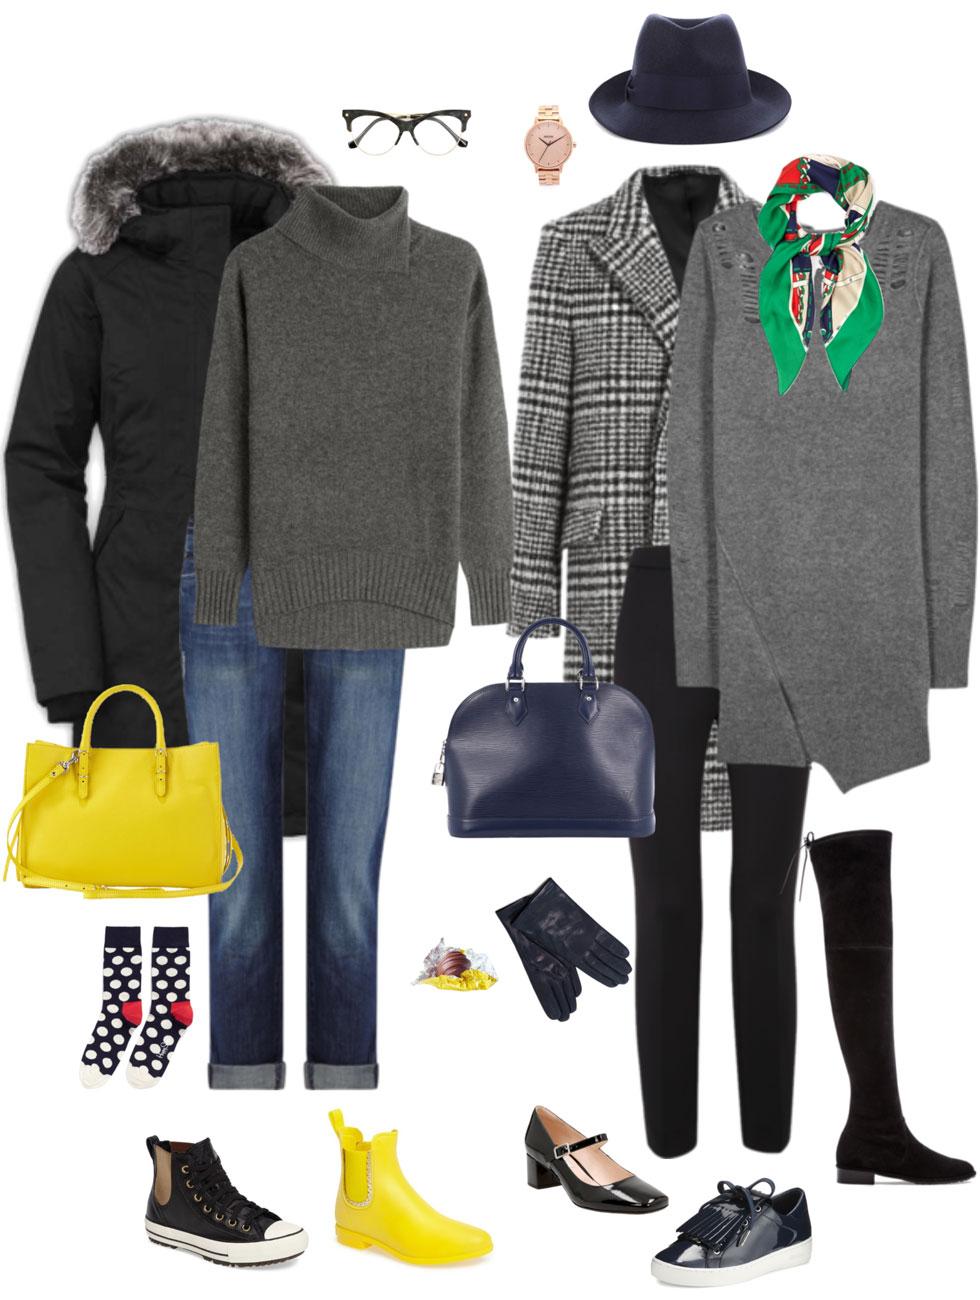 Ensemble Style Advice - Black & Grey with a Kick